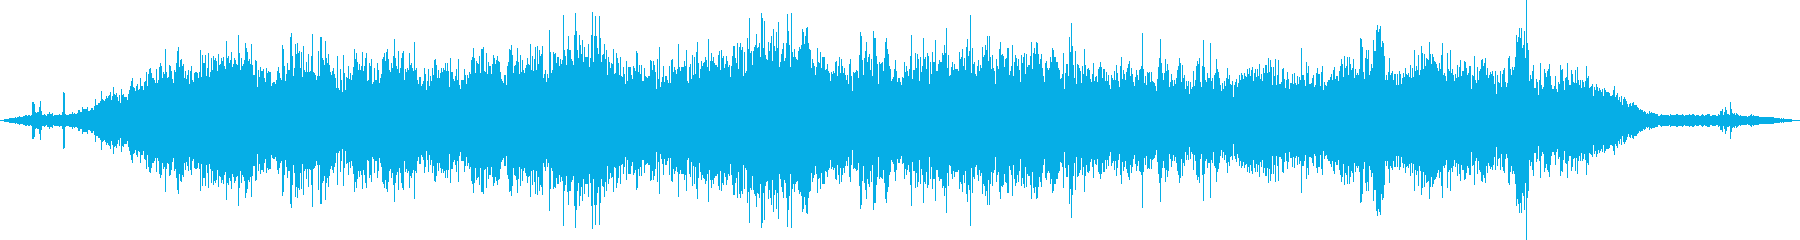 Infiniti Fx 35 Cr...の再生済みの波形